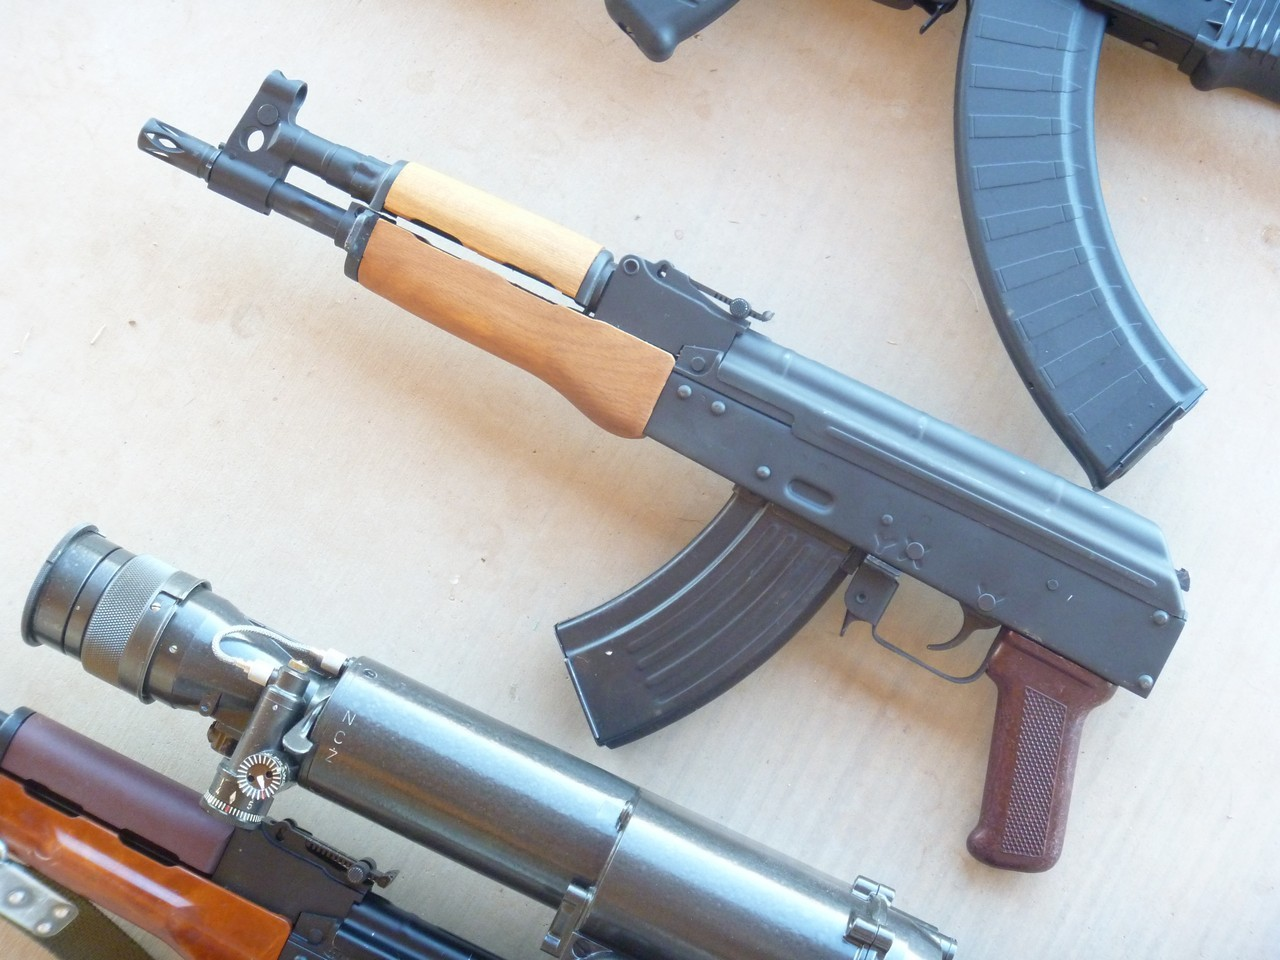 Which AK pistol?